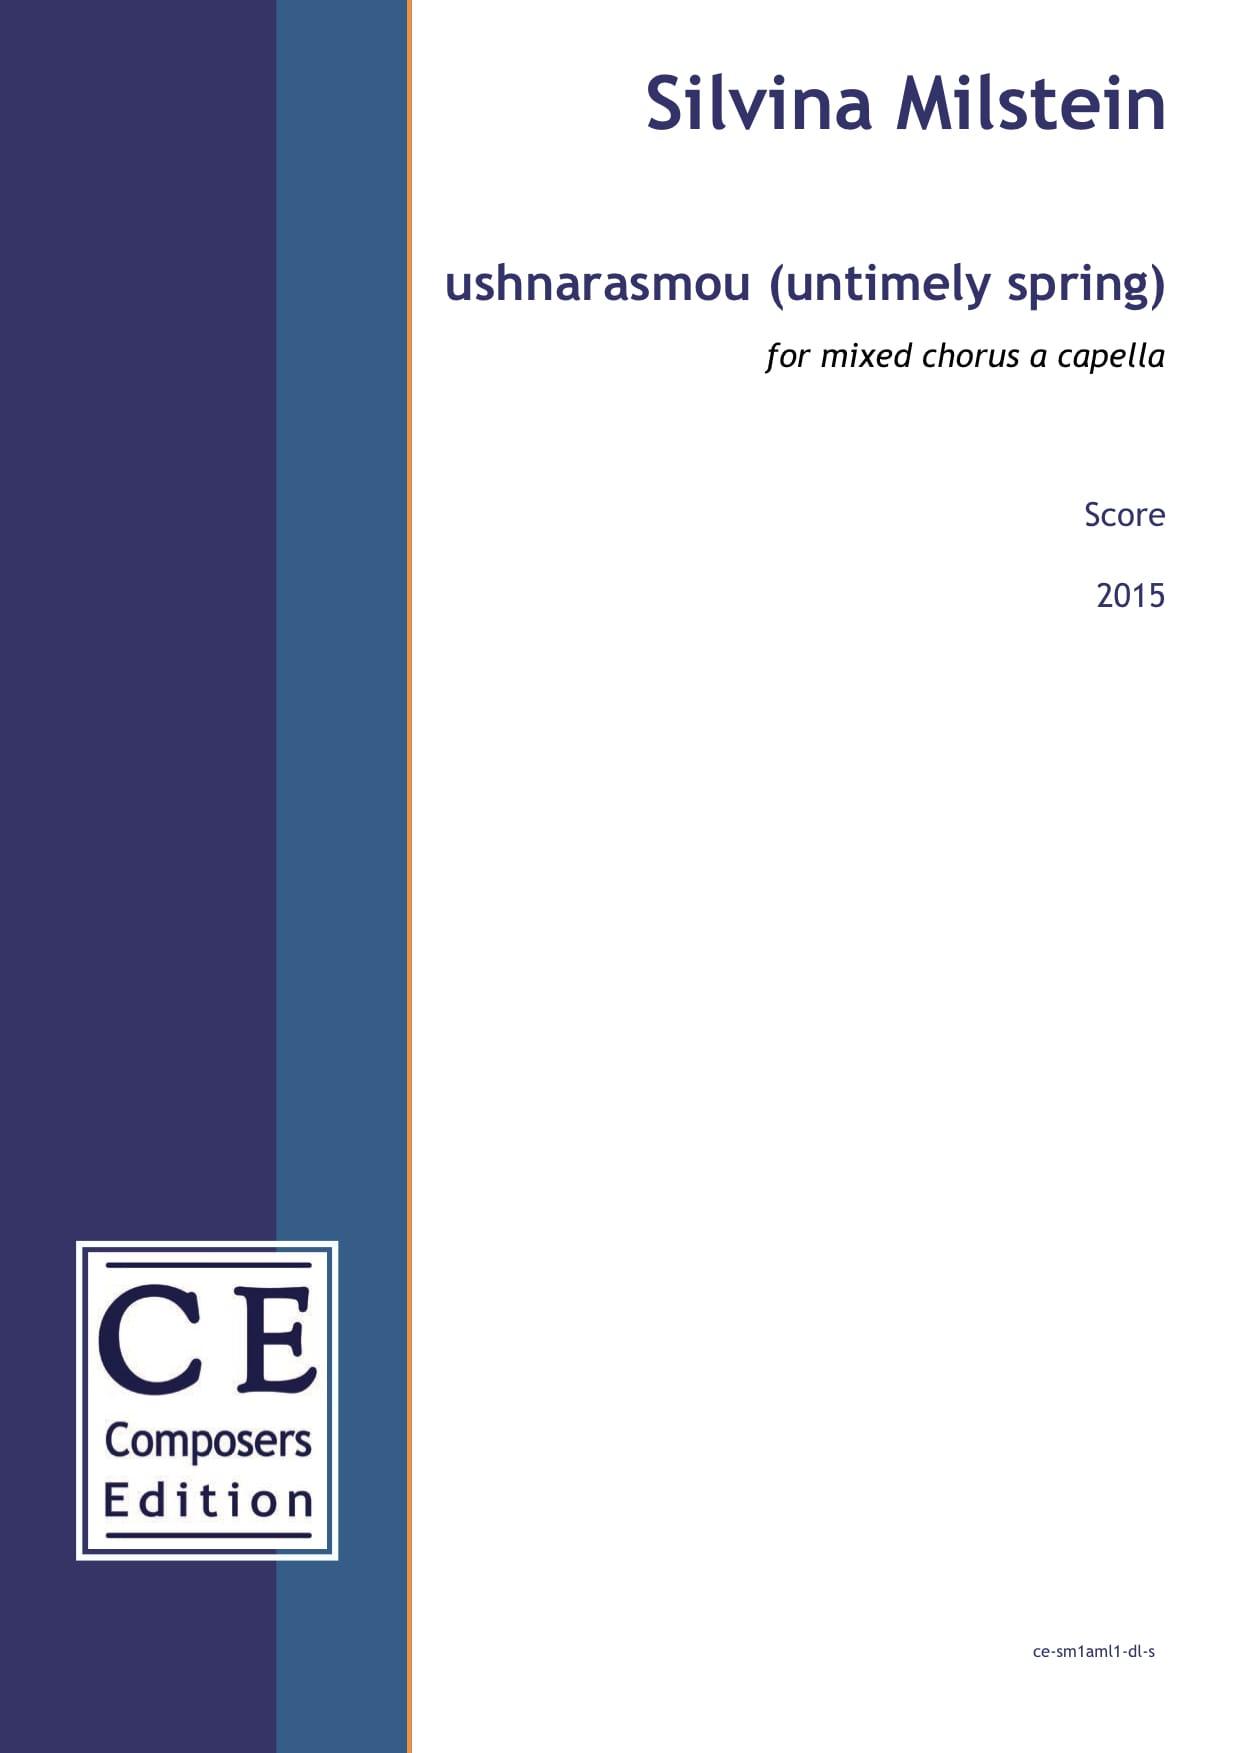 Silvina Milstein: ushnarasmou (untimely spring) for mixed chorus a capella